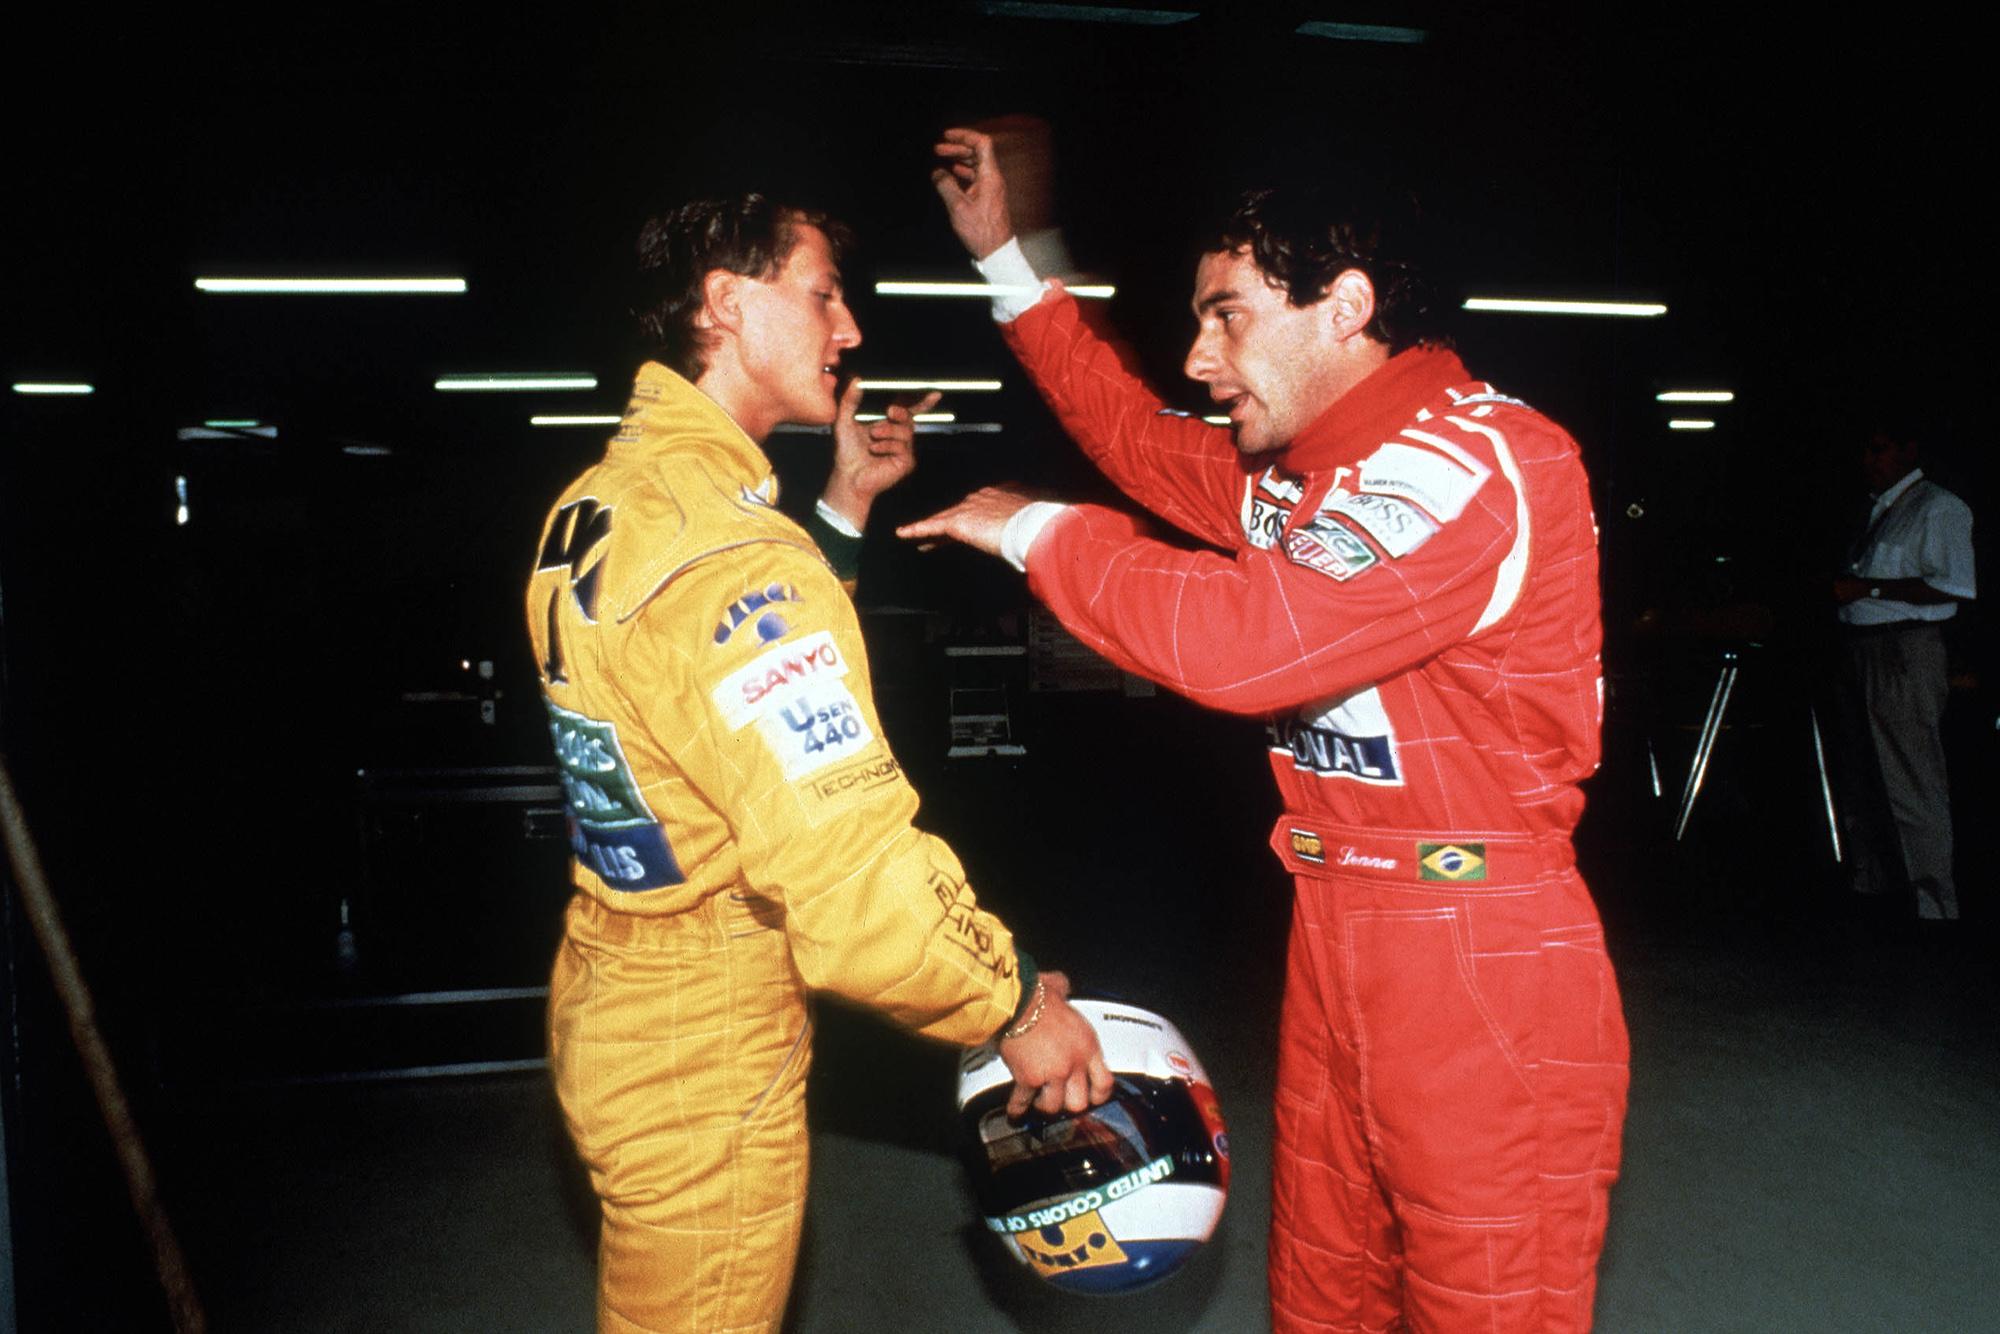 Ayrton Senna accuses Michael Schumacher of blocking him on track ahead of the 1992 German Grand Prix